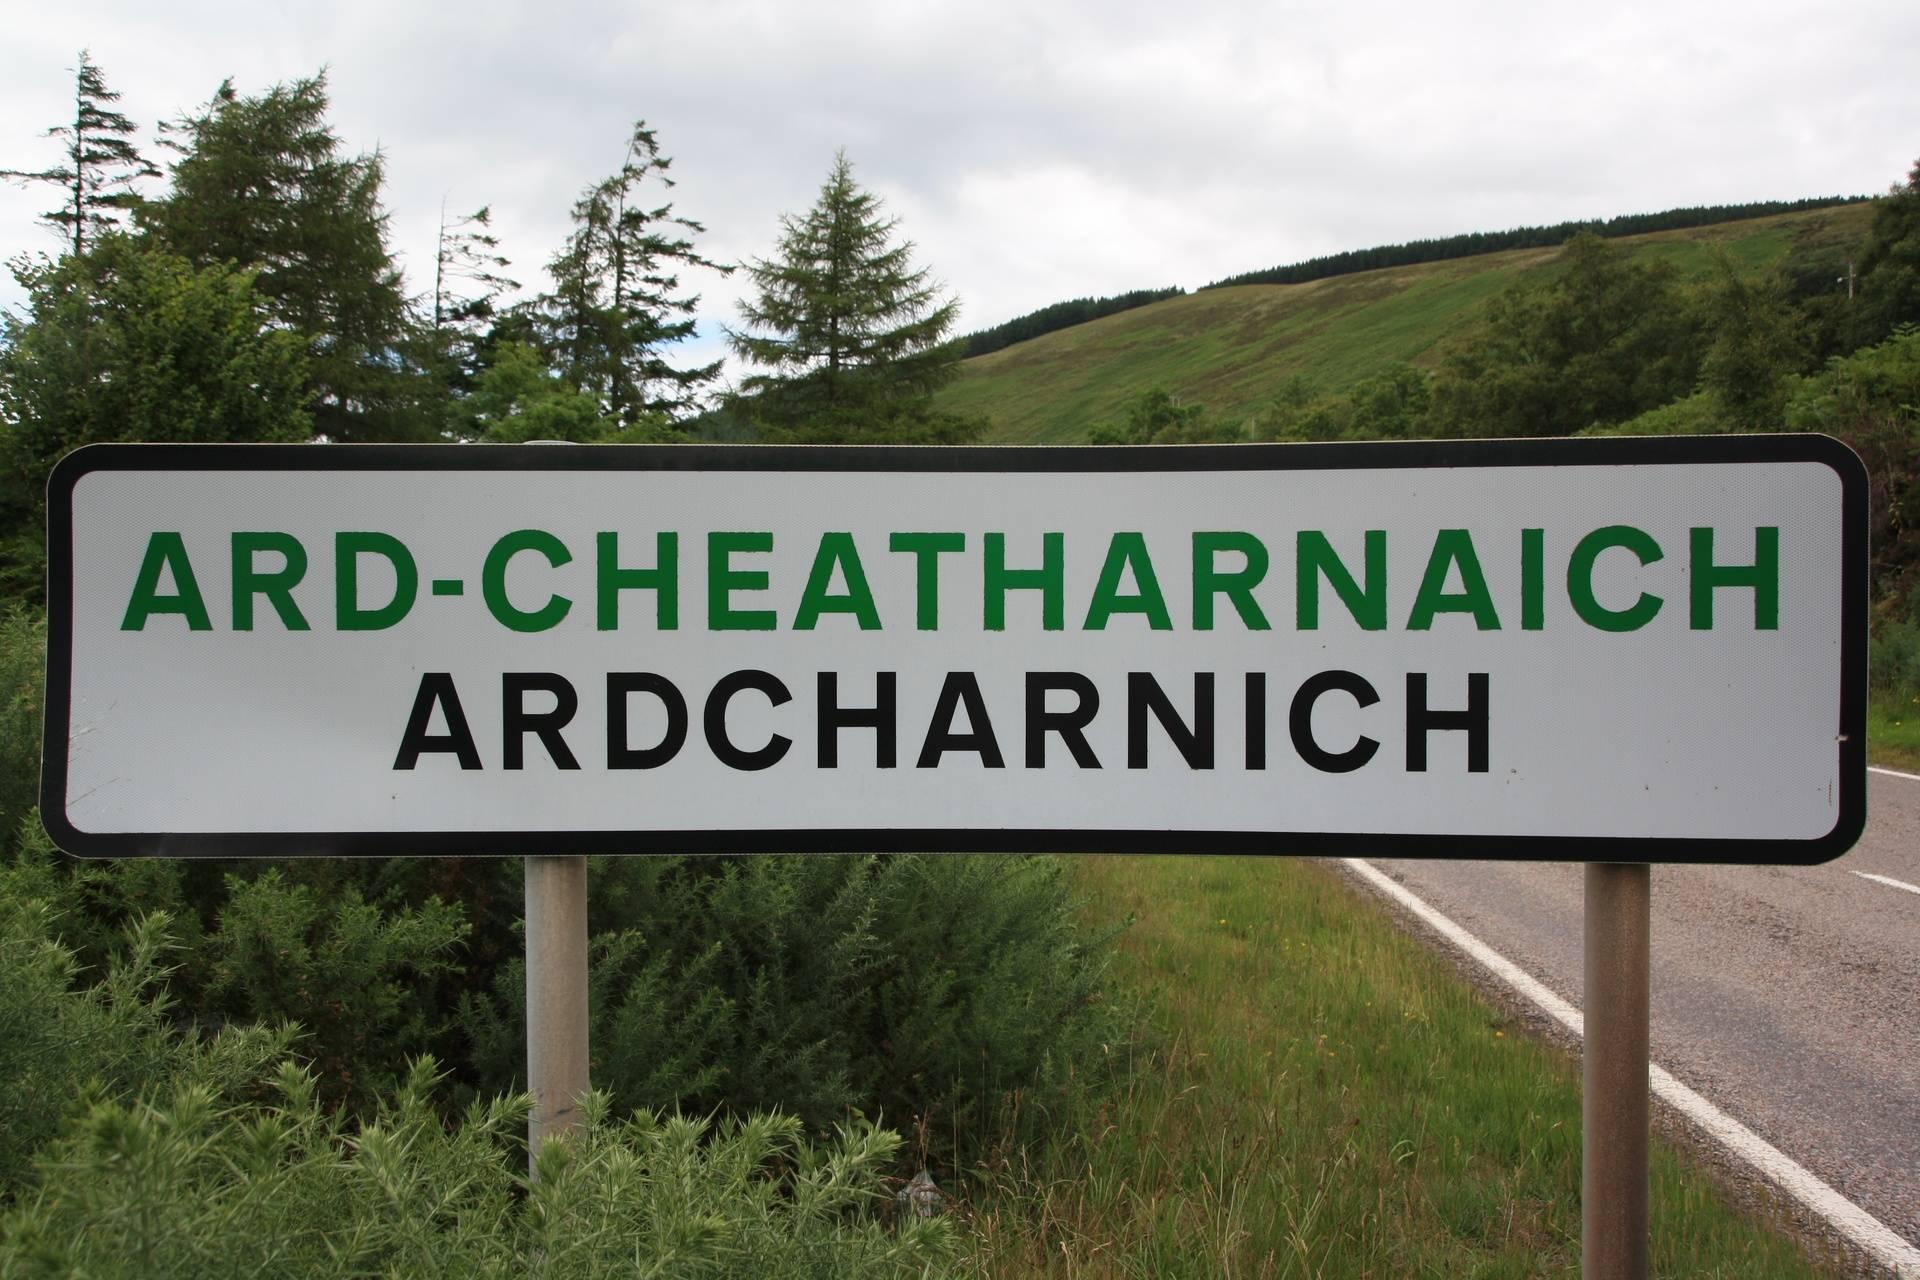 Ardcharnich, where my grandfather was born